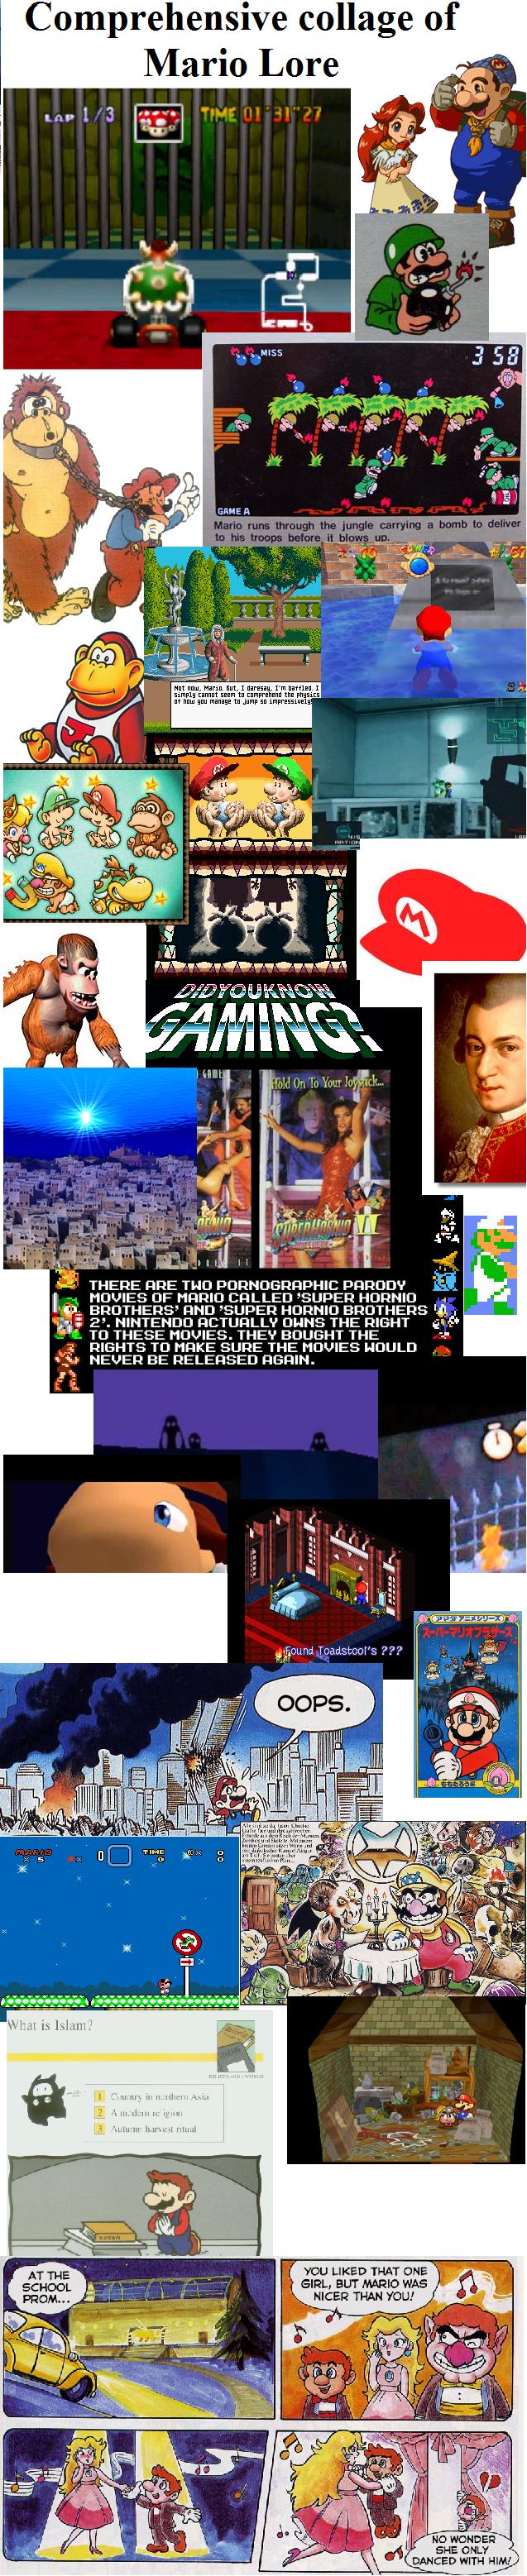 Mario+has+the+deepest+lore_281faa_498375